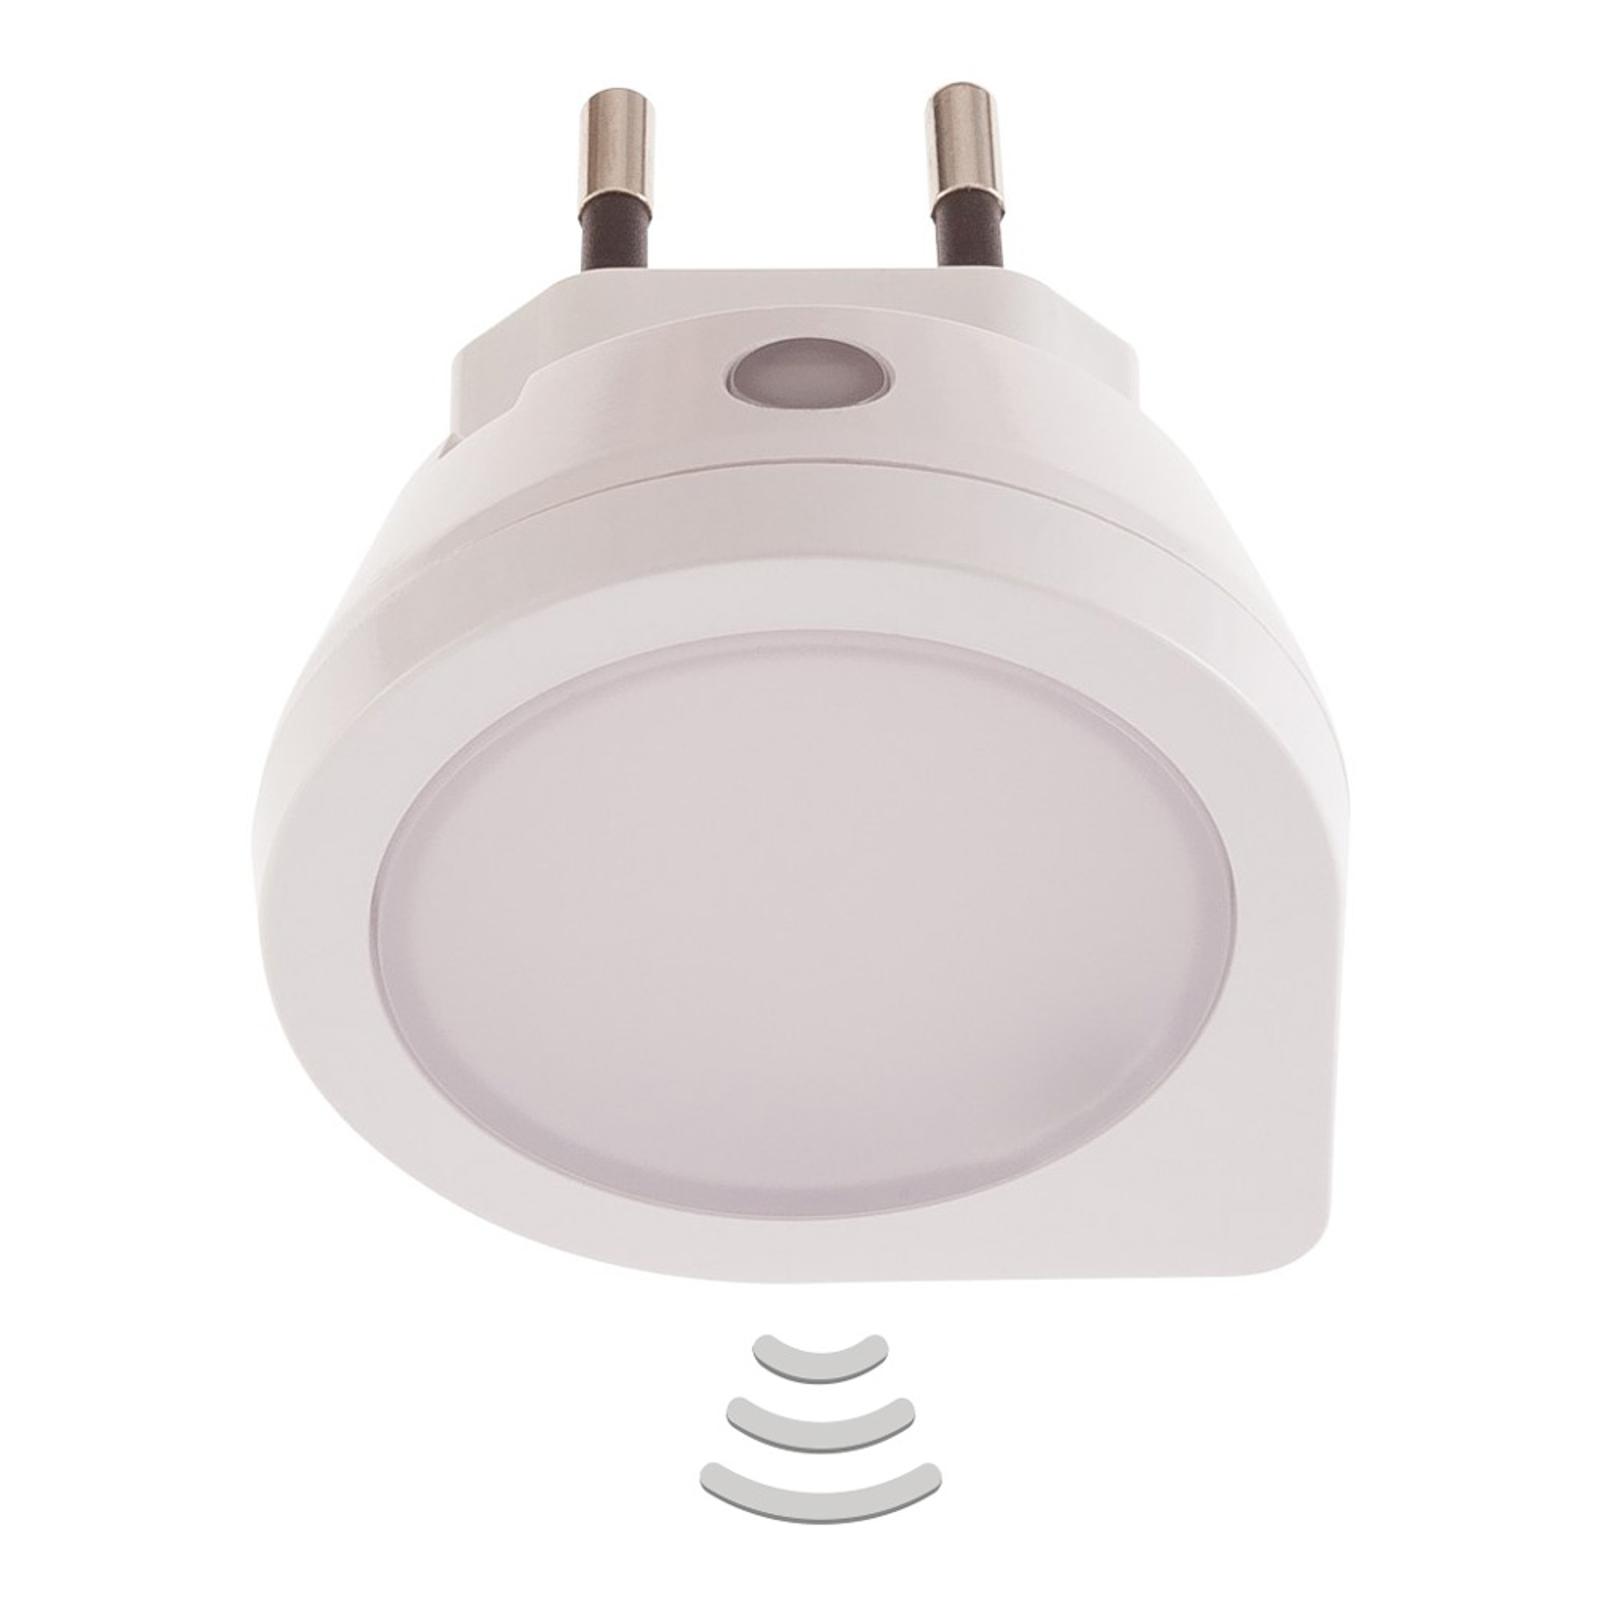 LED-Steckdosenlampe Nachtlicht Luna Sensor